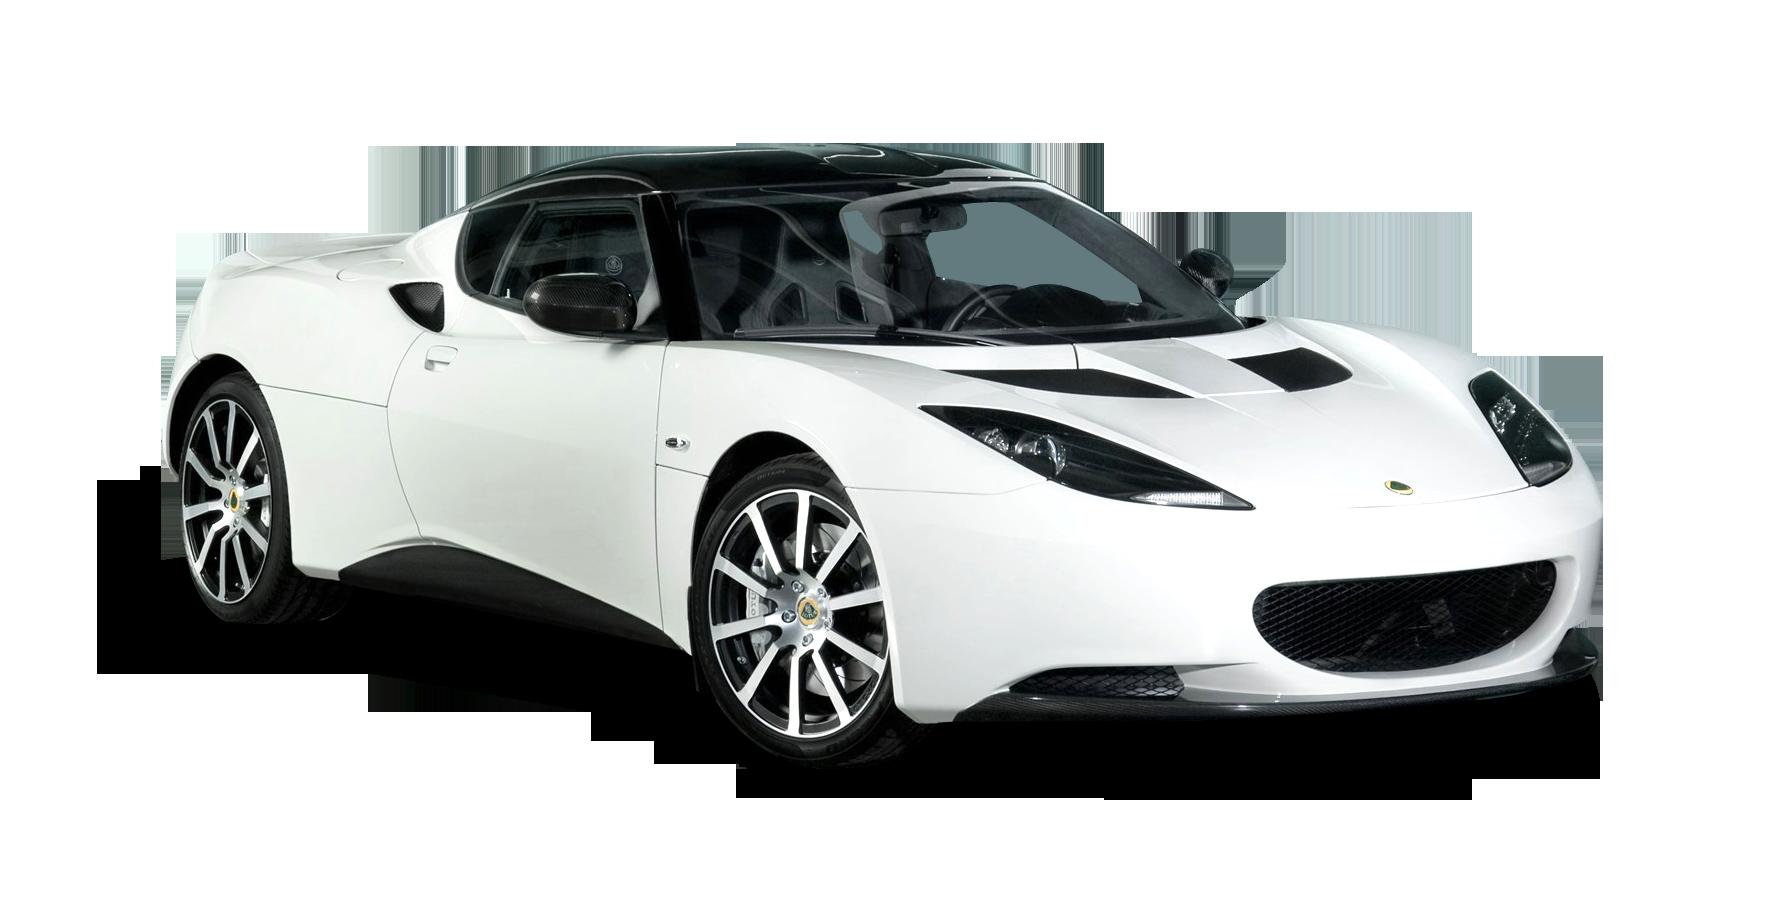 White Lotus Evora Carbon Car PNG Image